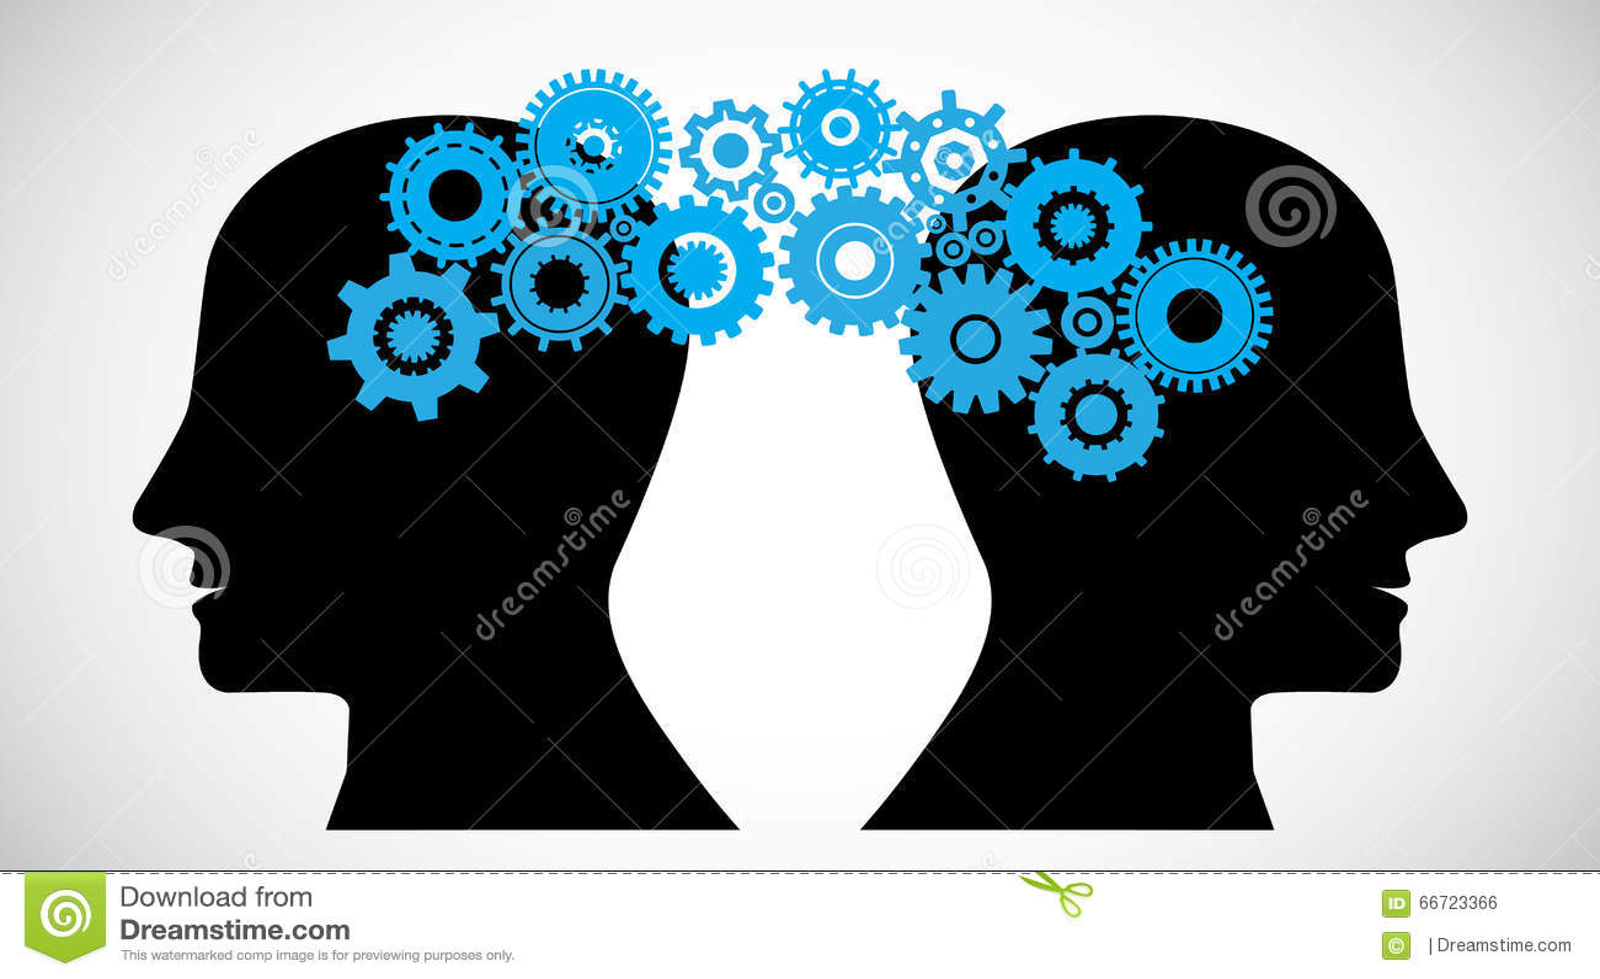 Concept Of Brain Storming, Knowledge Sharing Between ... Human Head Brain Vector